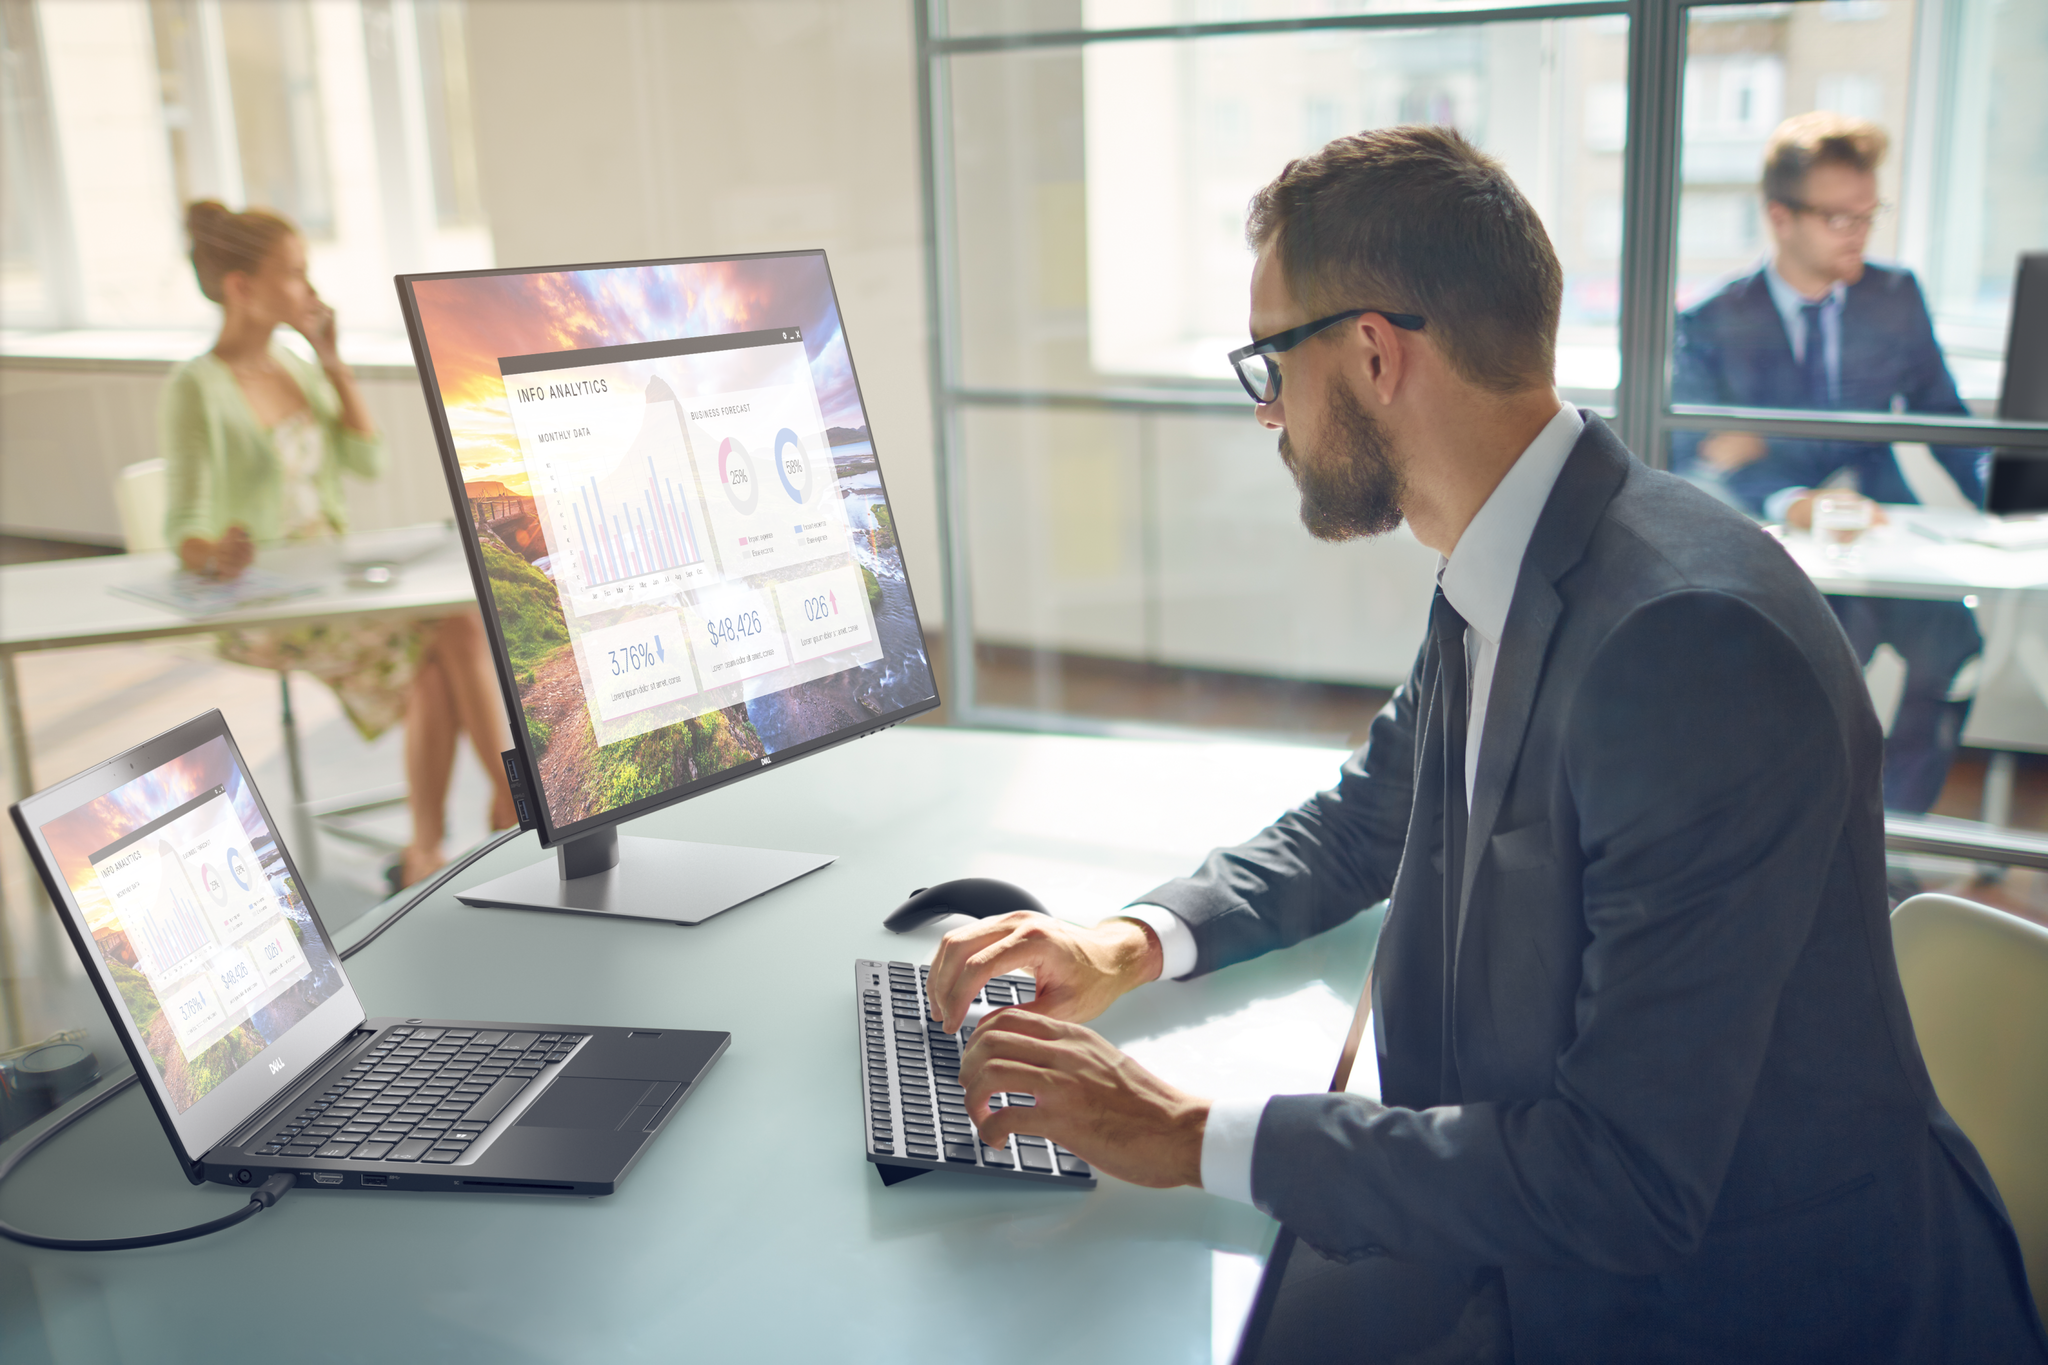 Dell Presenta Los Monitores Ultrasharp U2419hc Y U2719dc